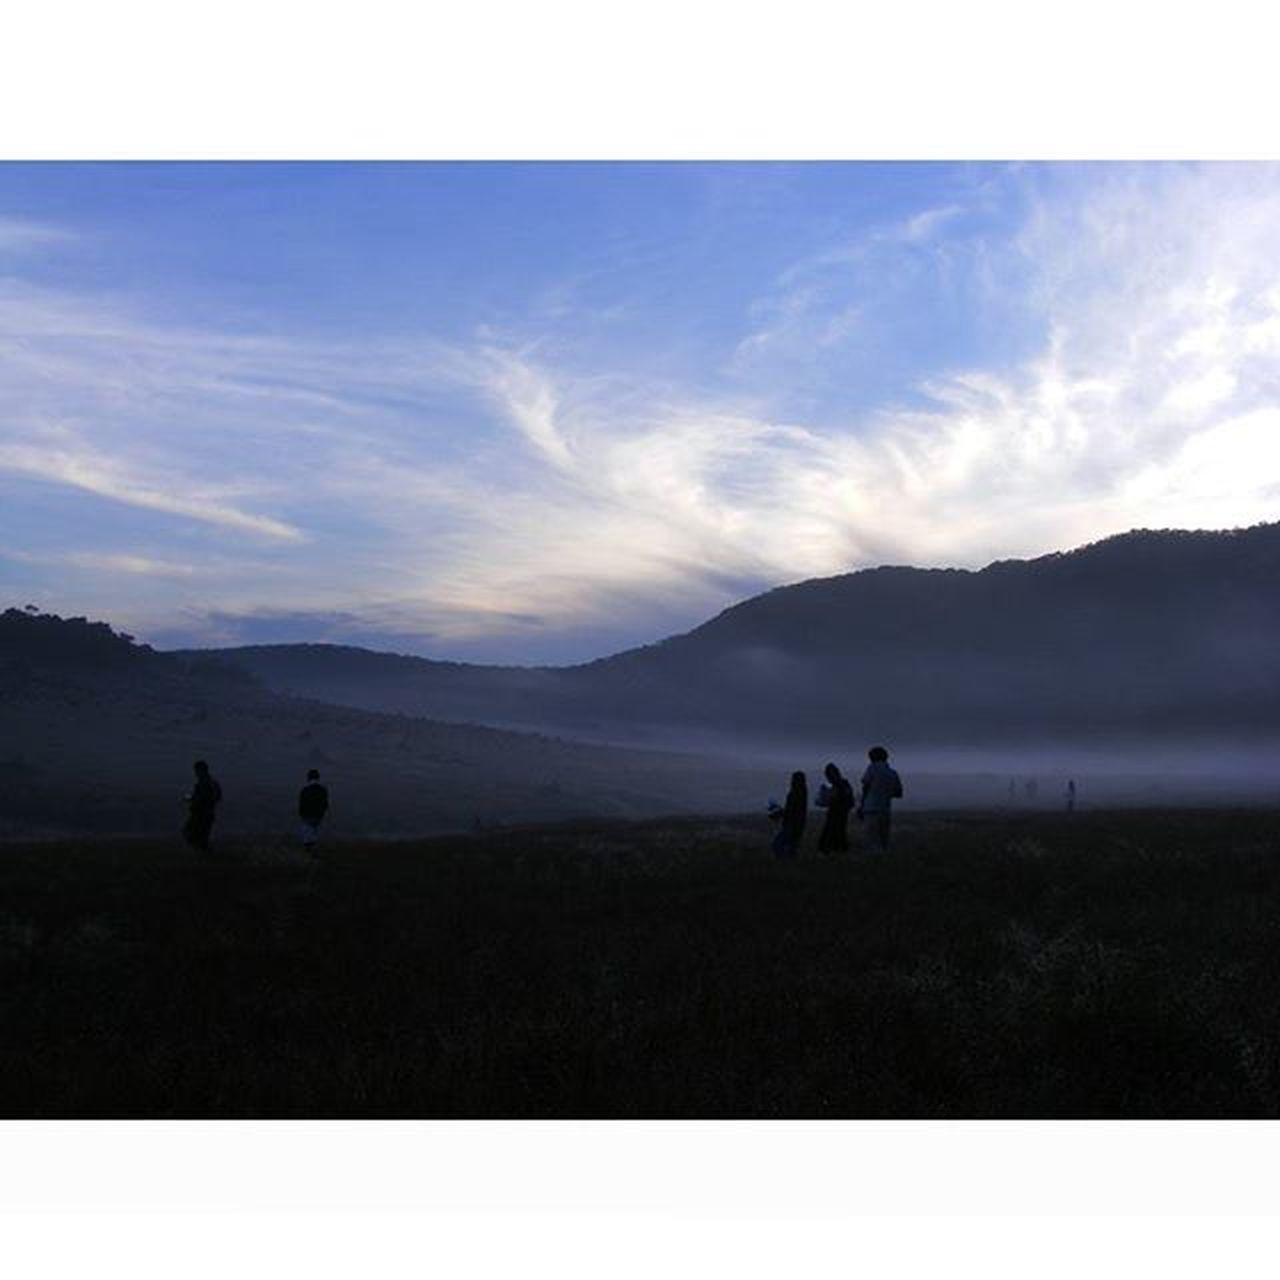 Kabut Pagi di Alunalunsuryakencana Gununggede Tamannasionalgununggedepangrango . 2011 Kameraprosumer Fujifilm Pendakiindonesia Instagunung Indomountain